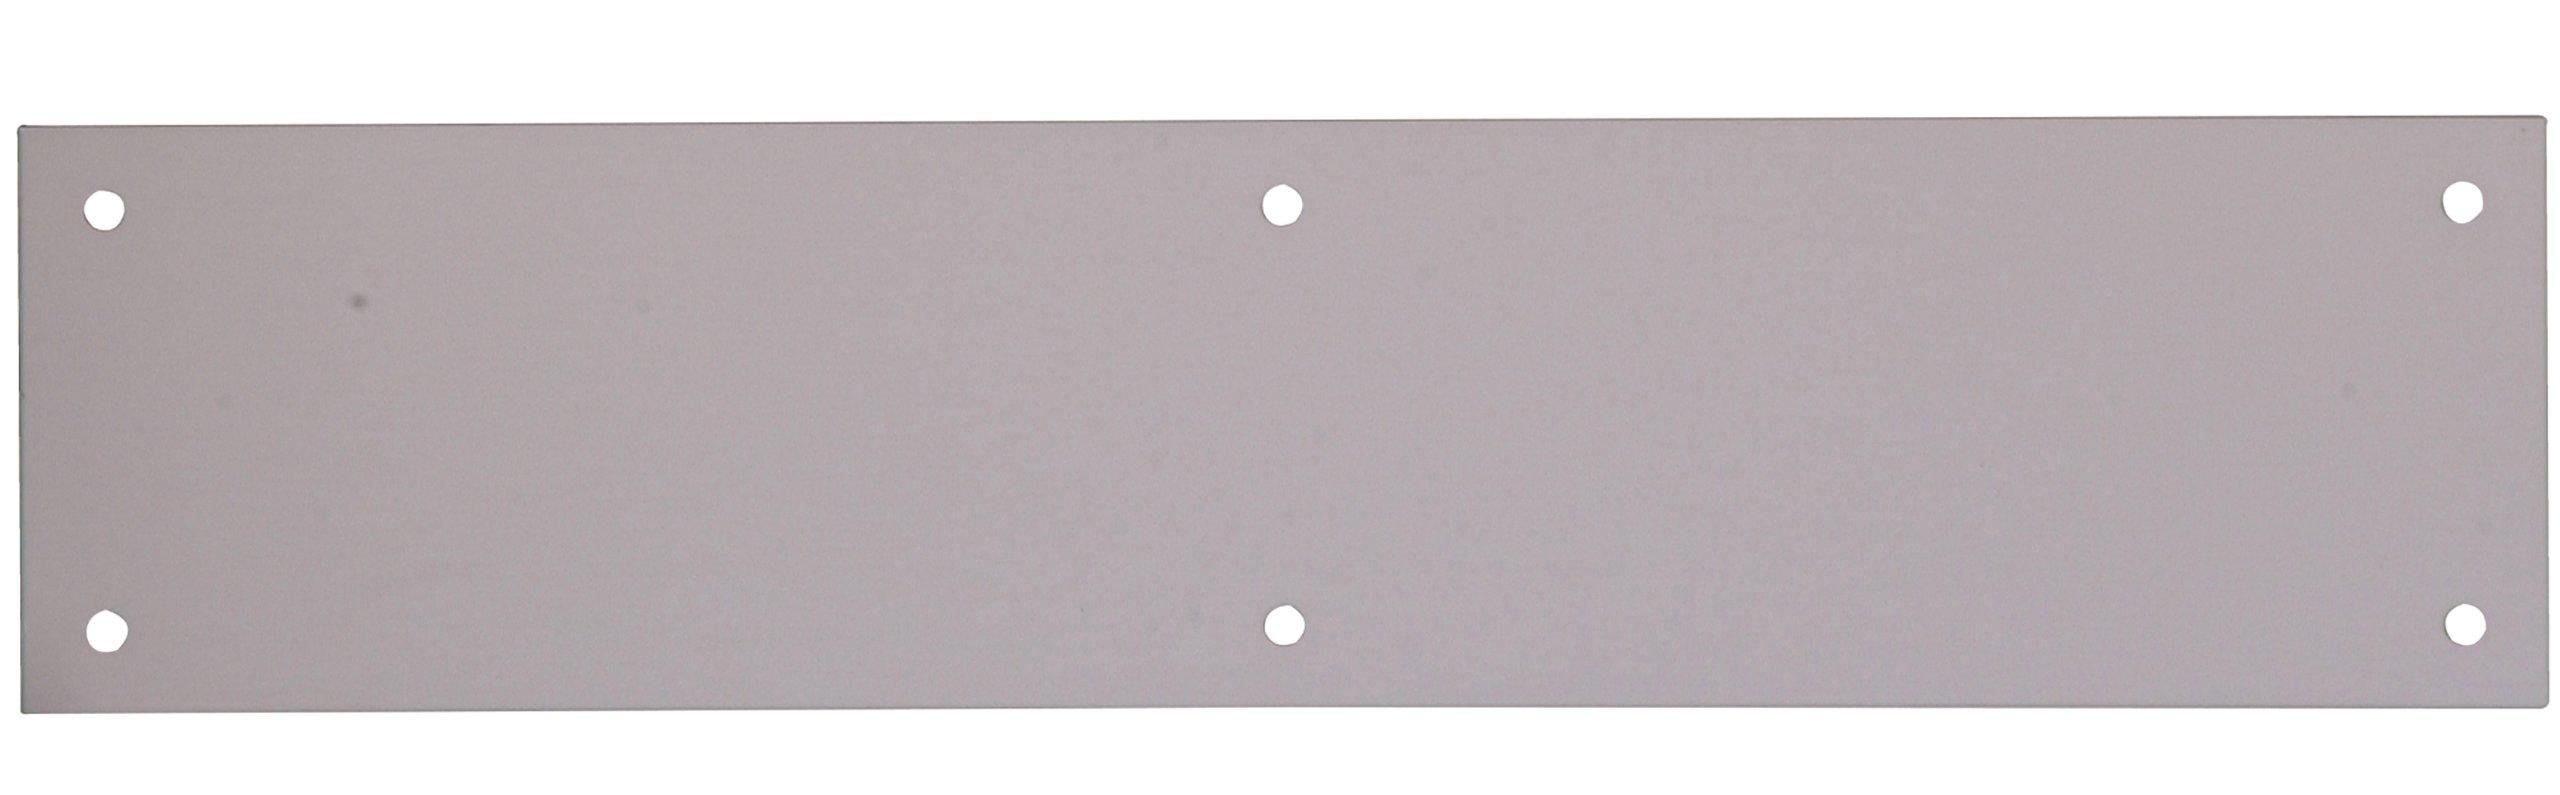 The Hillman Group 852734 3-1/2 ''x 15'' Push Plate - Aluminum - Aluminum Finish 1-Pack